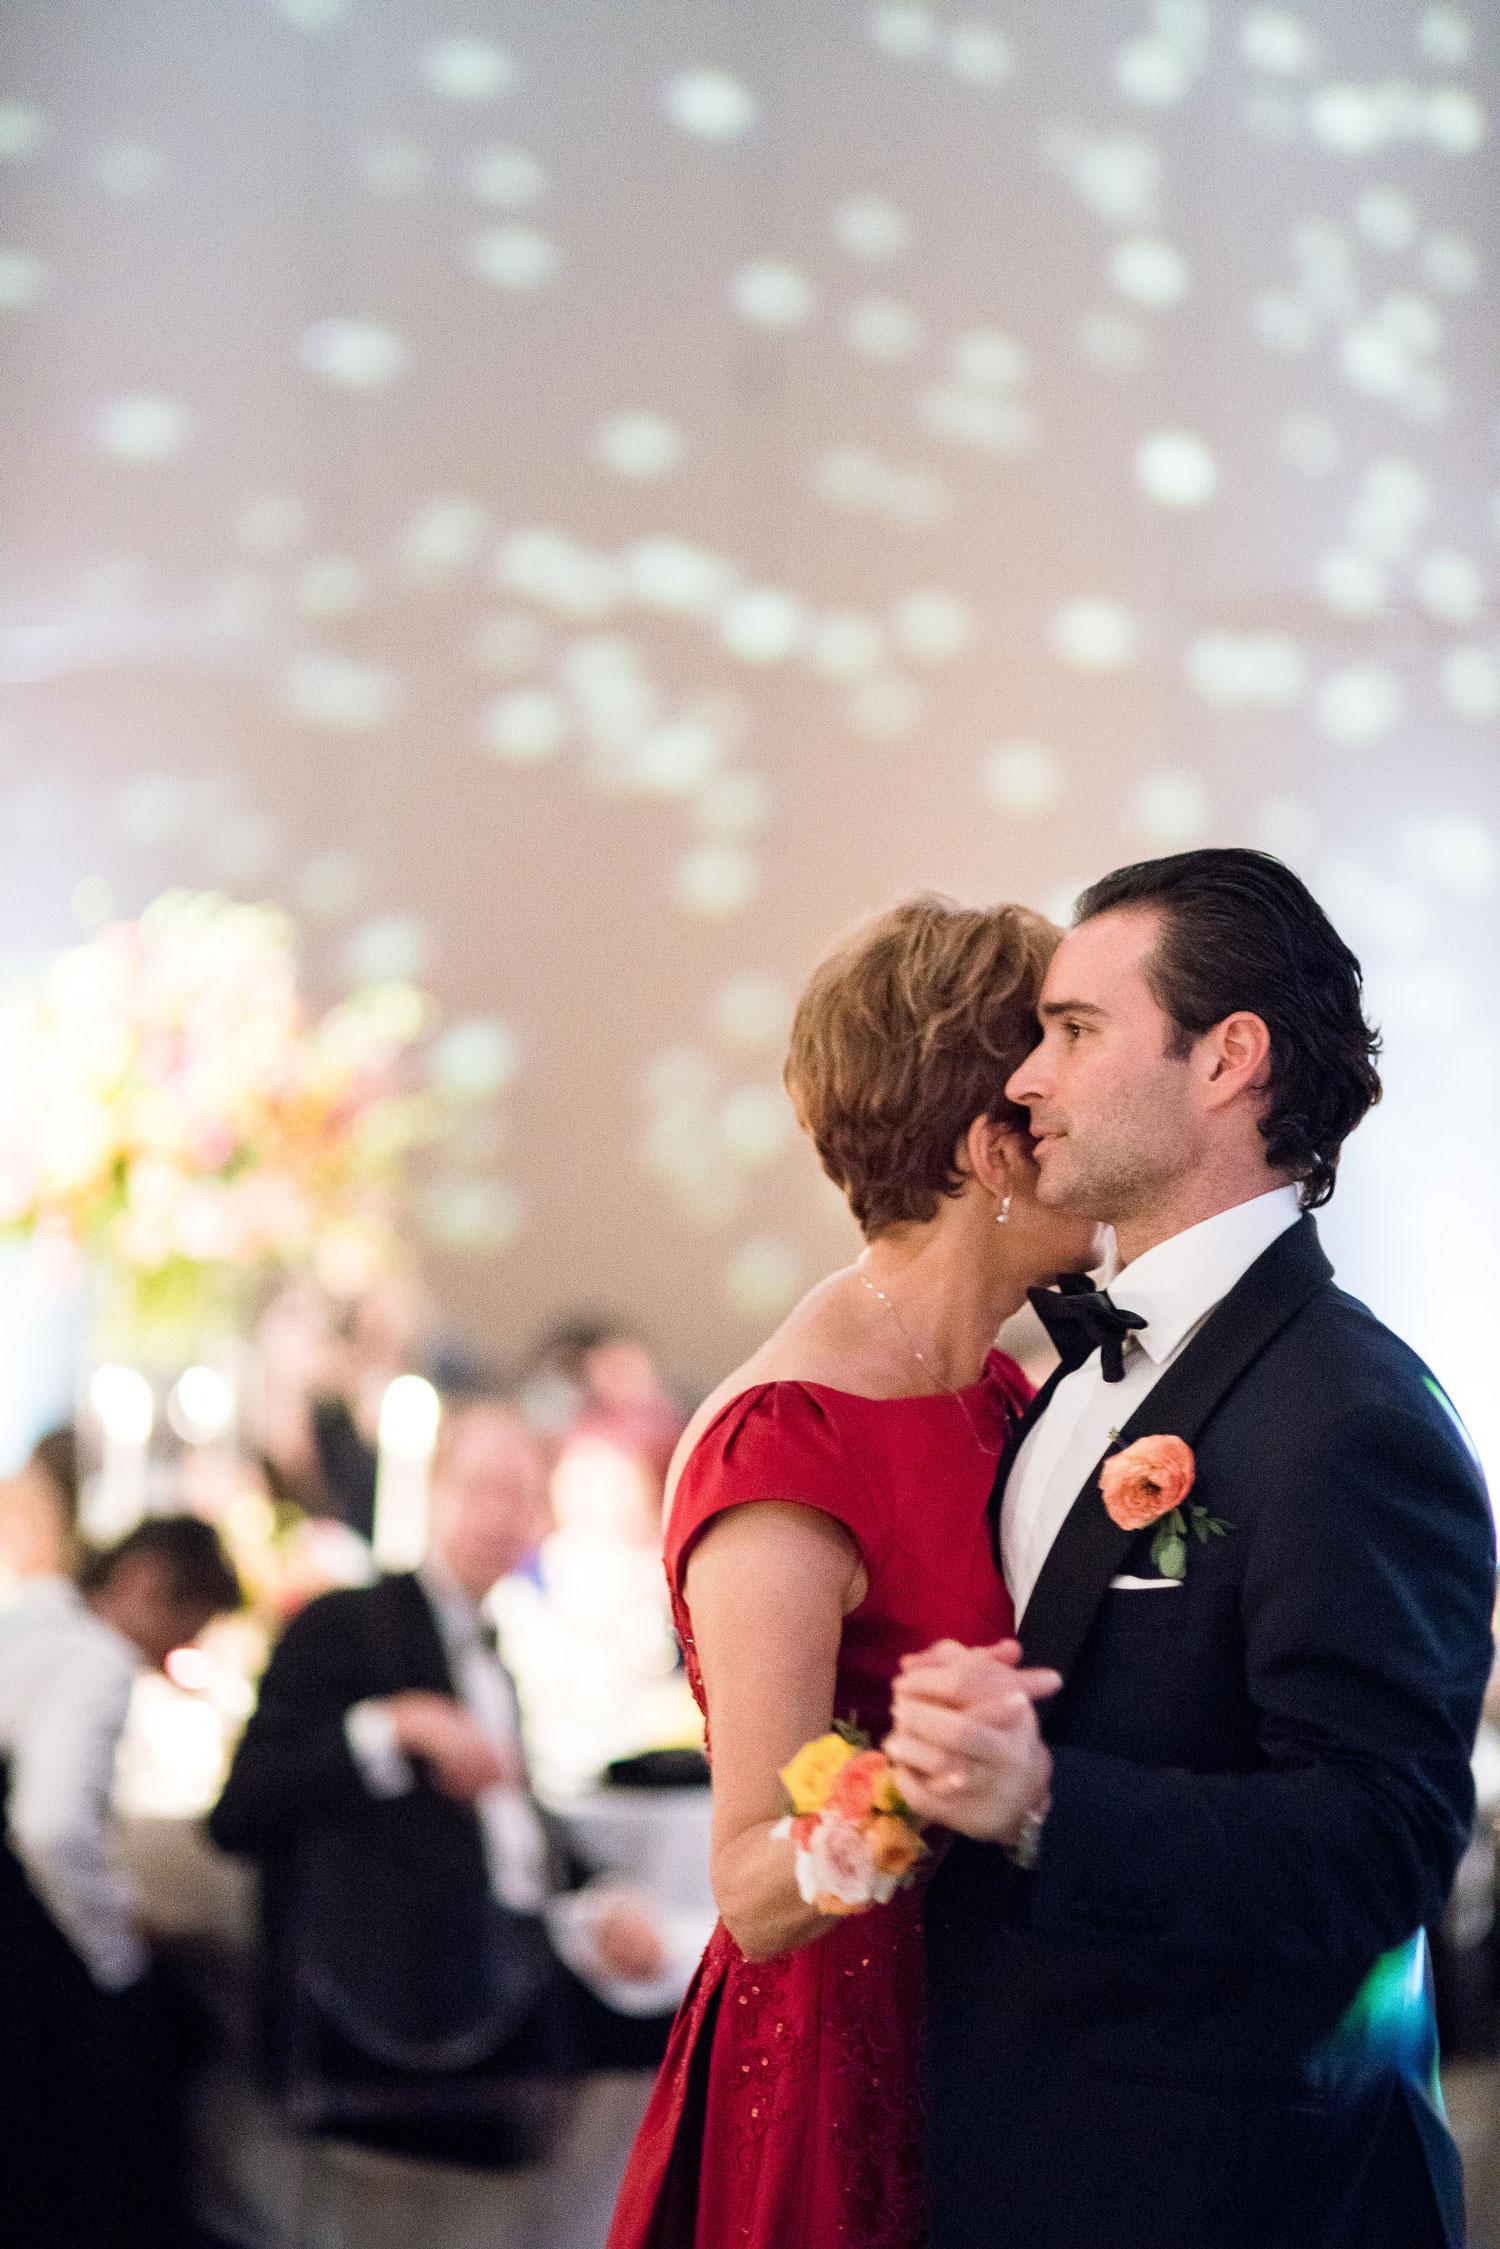 Como homenagear as maes dos noivos no casamento 5